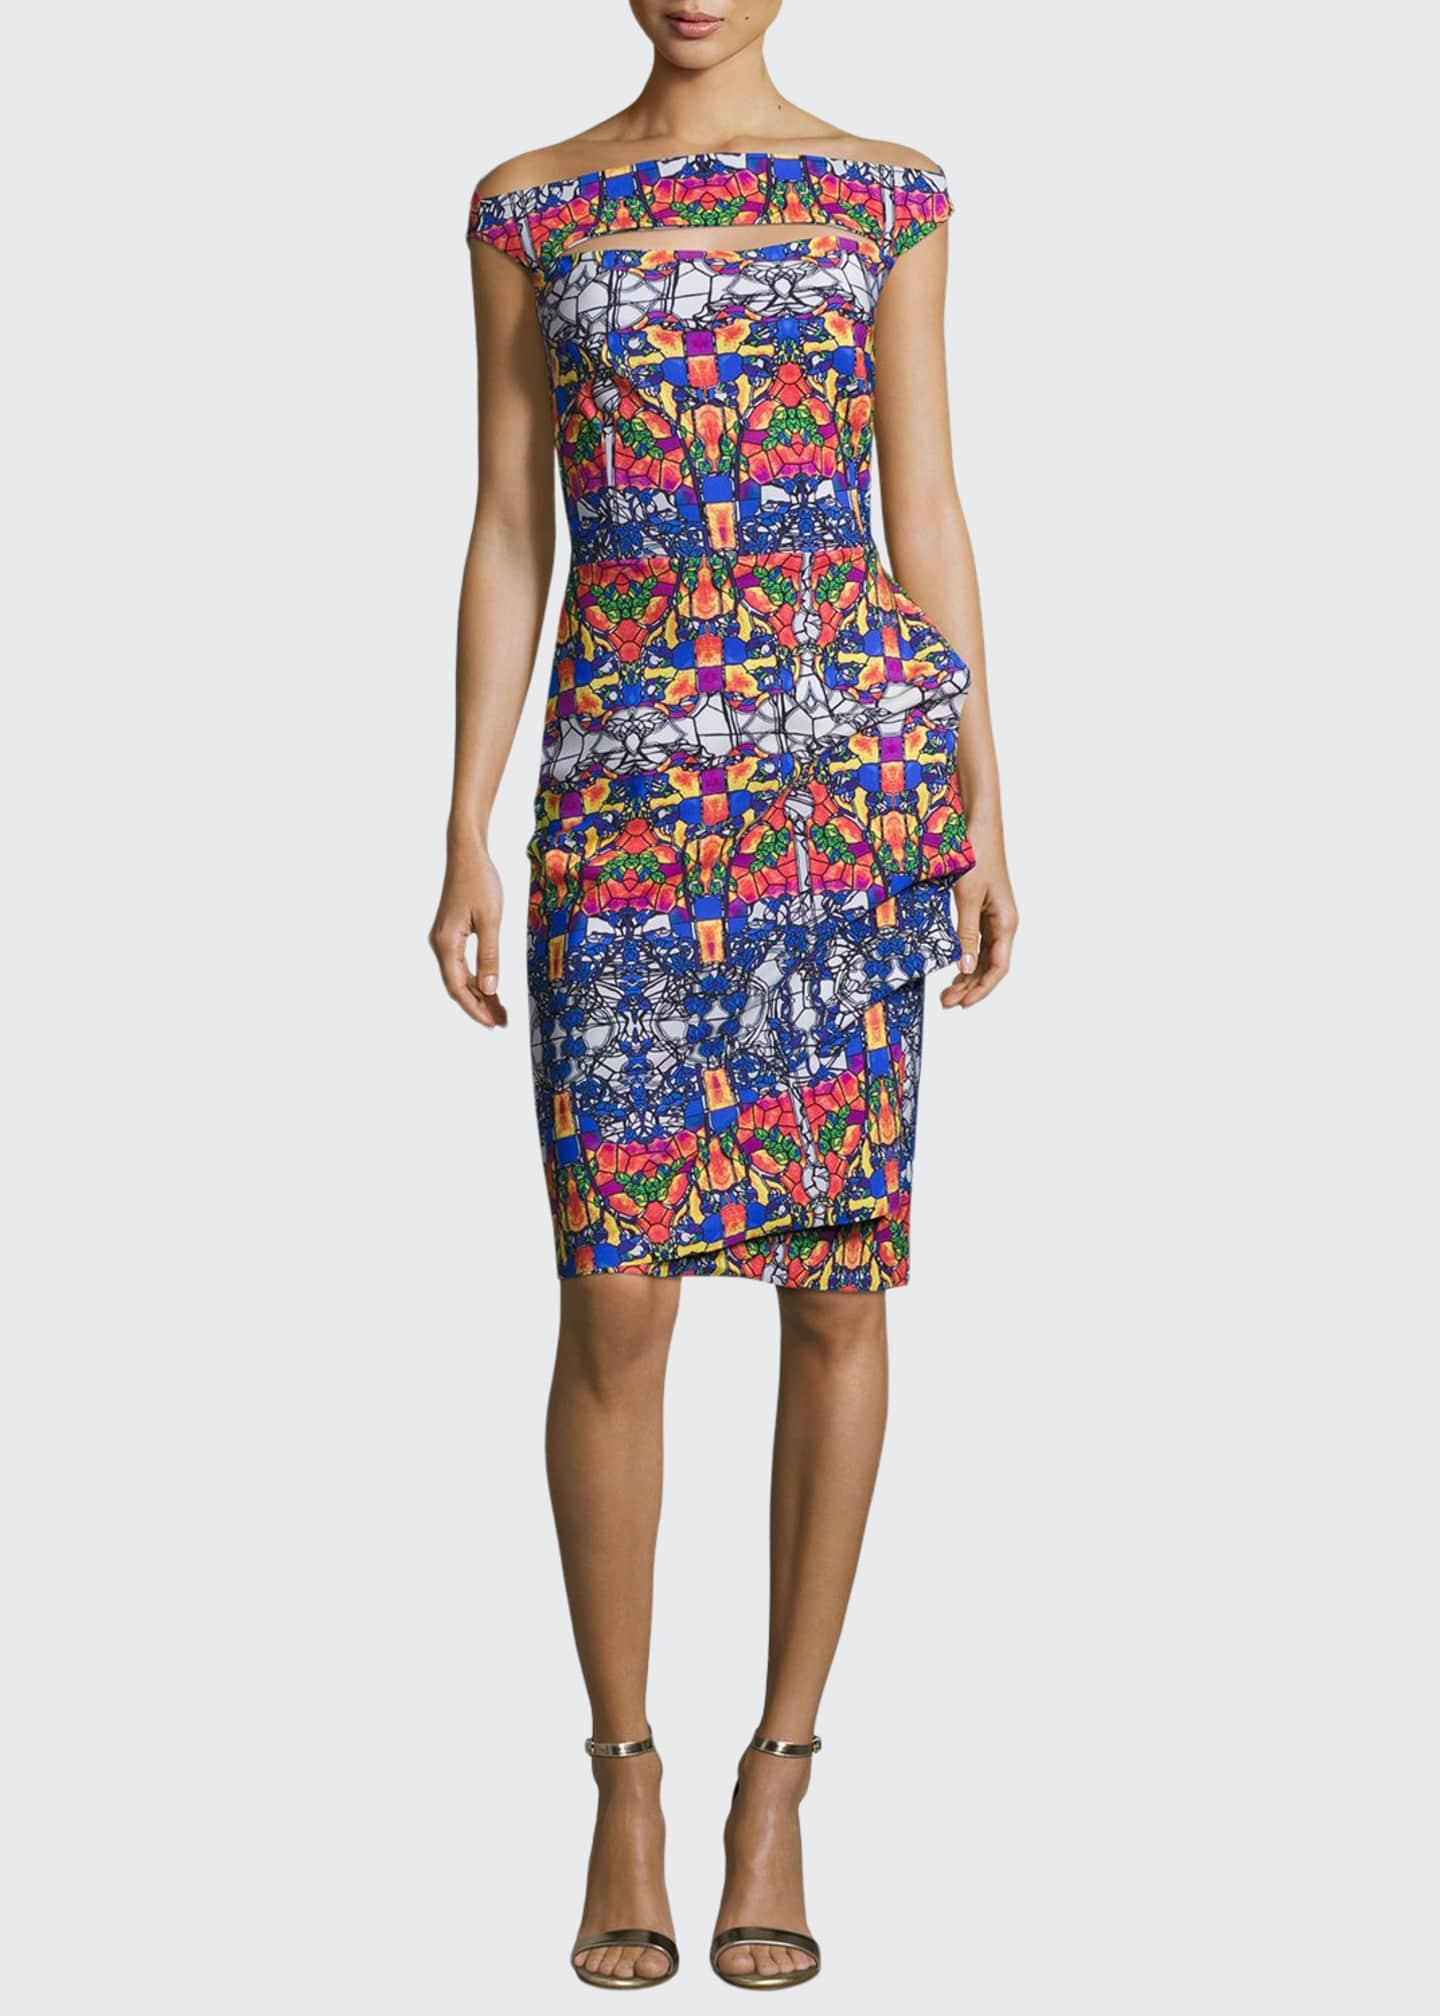 Chiara Boni La Petite Robe Off-the-Shoulder Printed Cutout